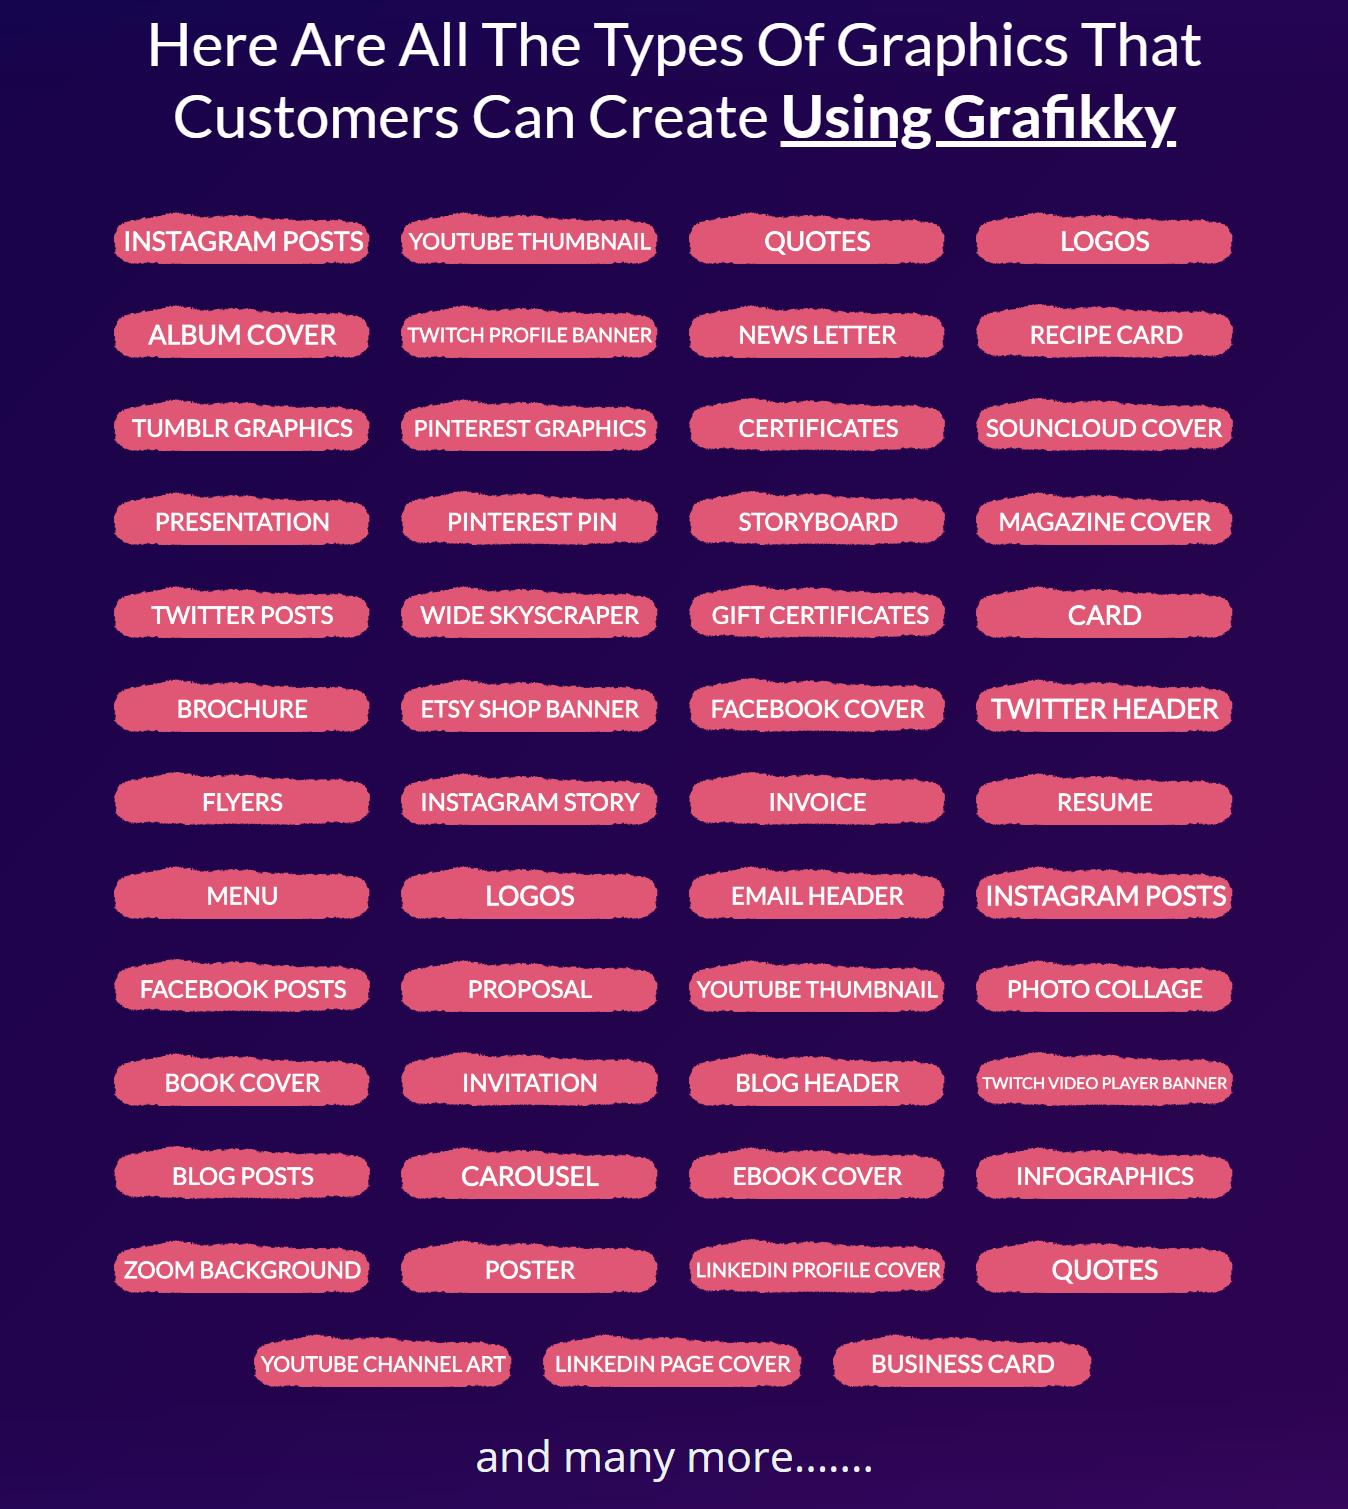 grafikky-demo-tools-bonus-review